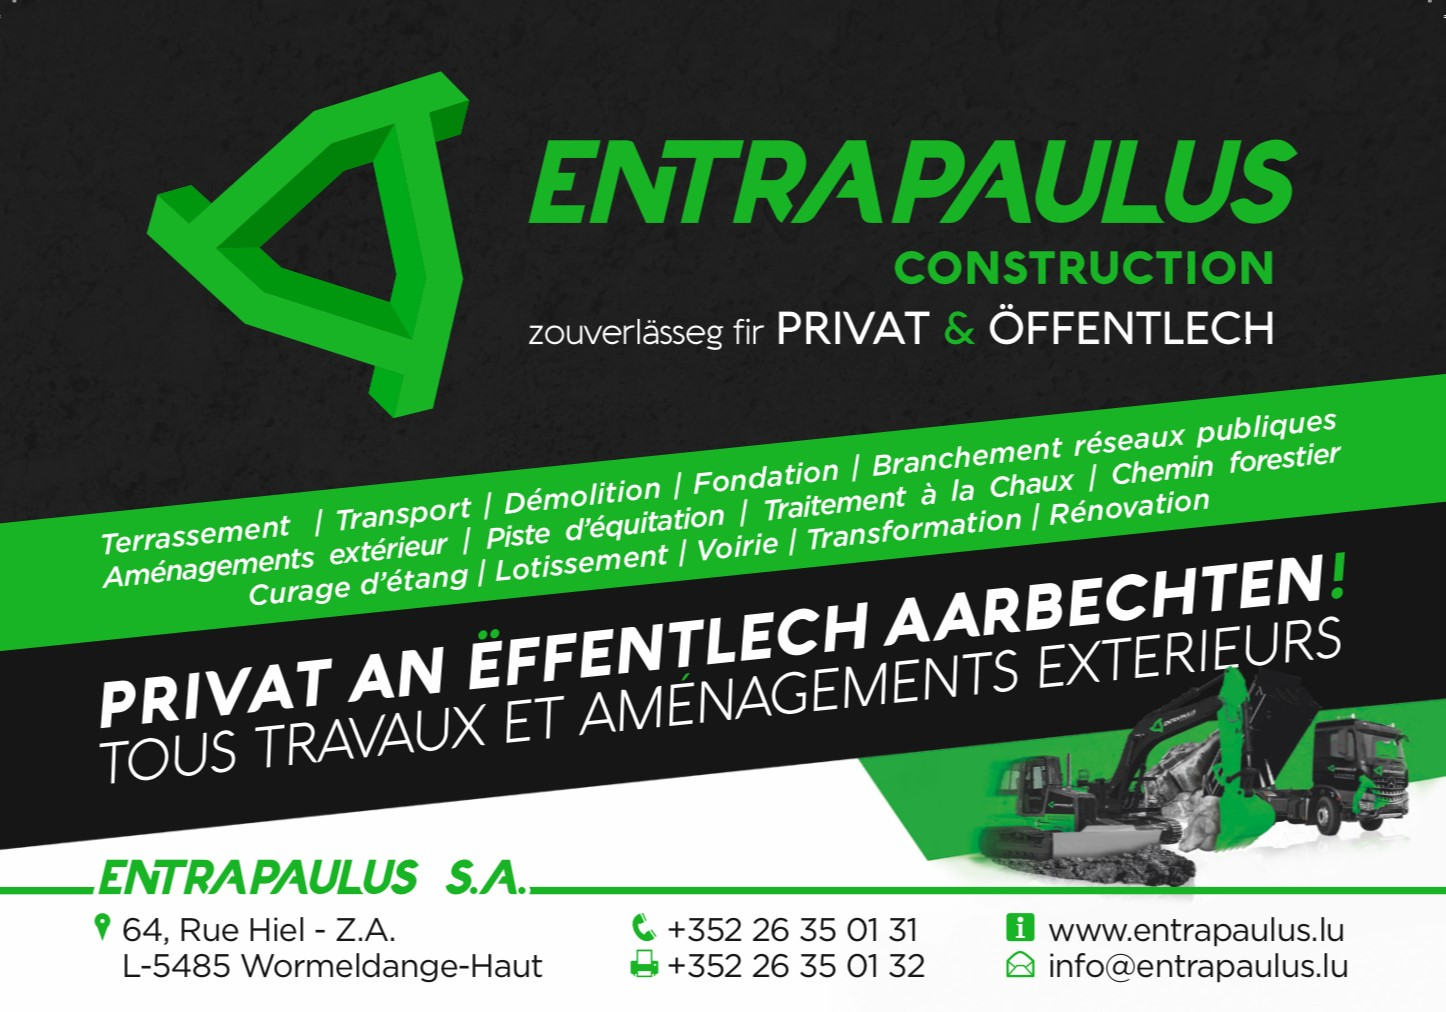 ENTRAPAULUS